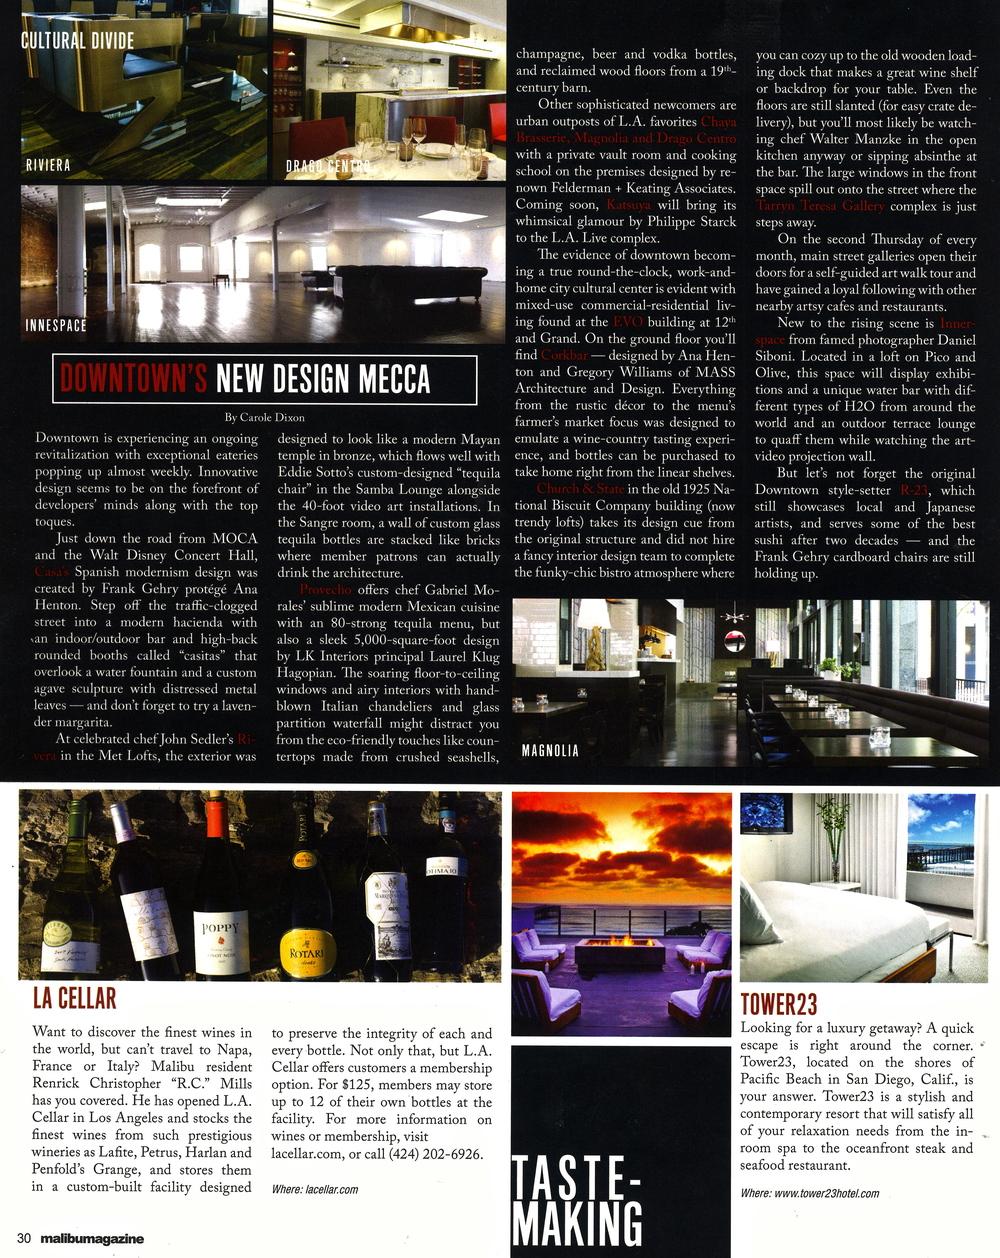 Malibu magazine_July 2009-1.jpg